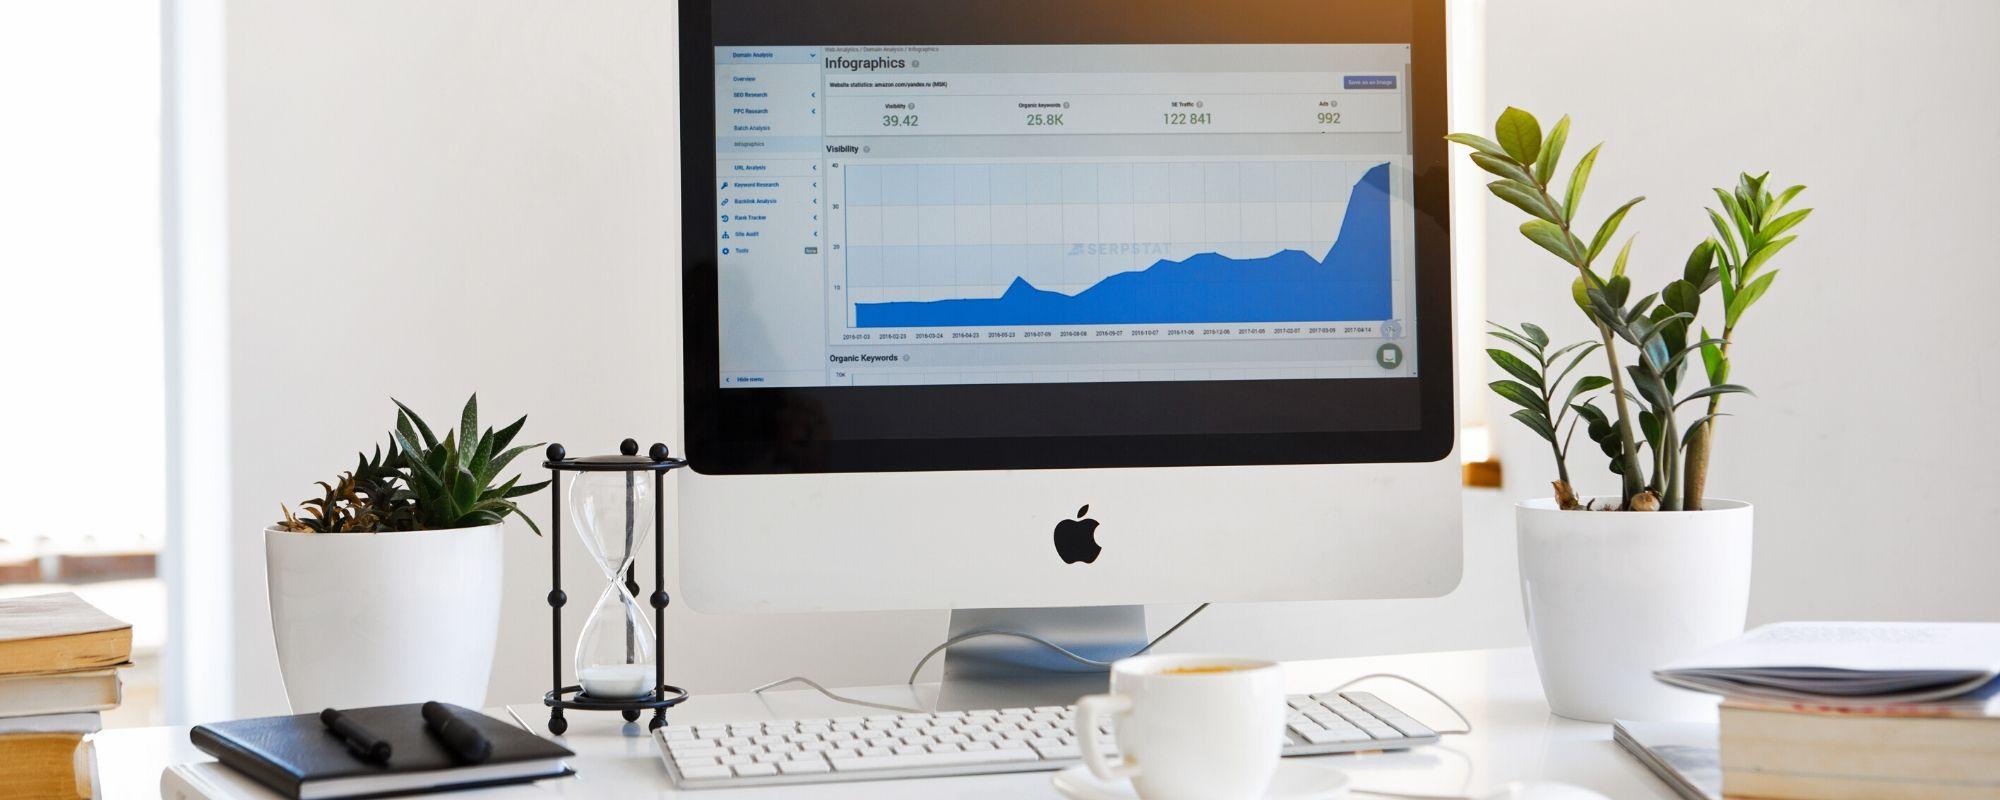 AdSenseが安定した収益を得るポイントとノウハウを紹介します。